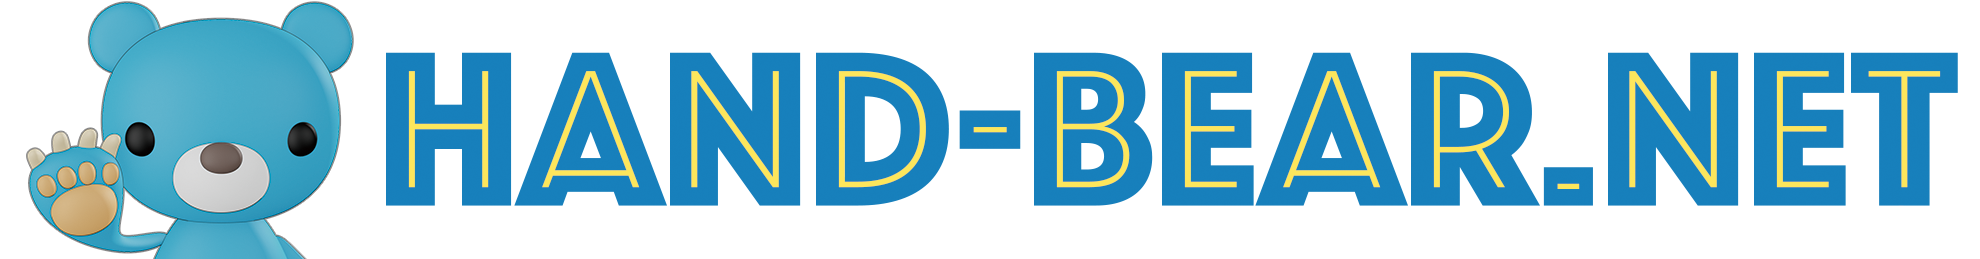 HAND-BEAR.NET-ハンドベア-